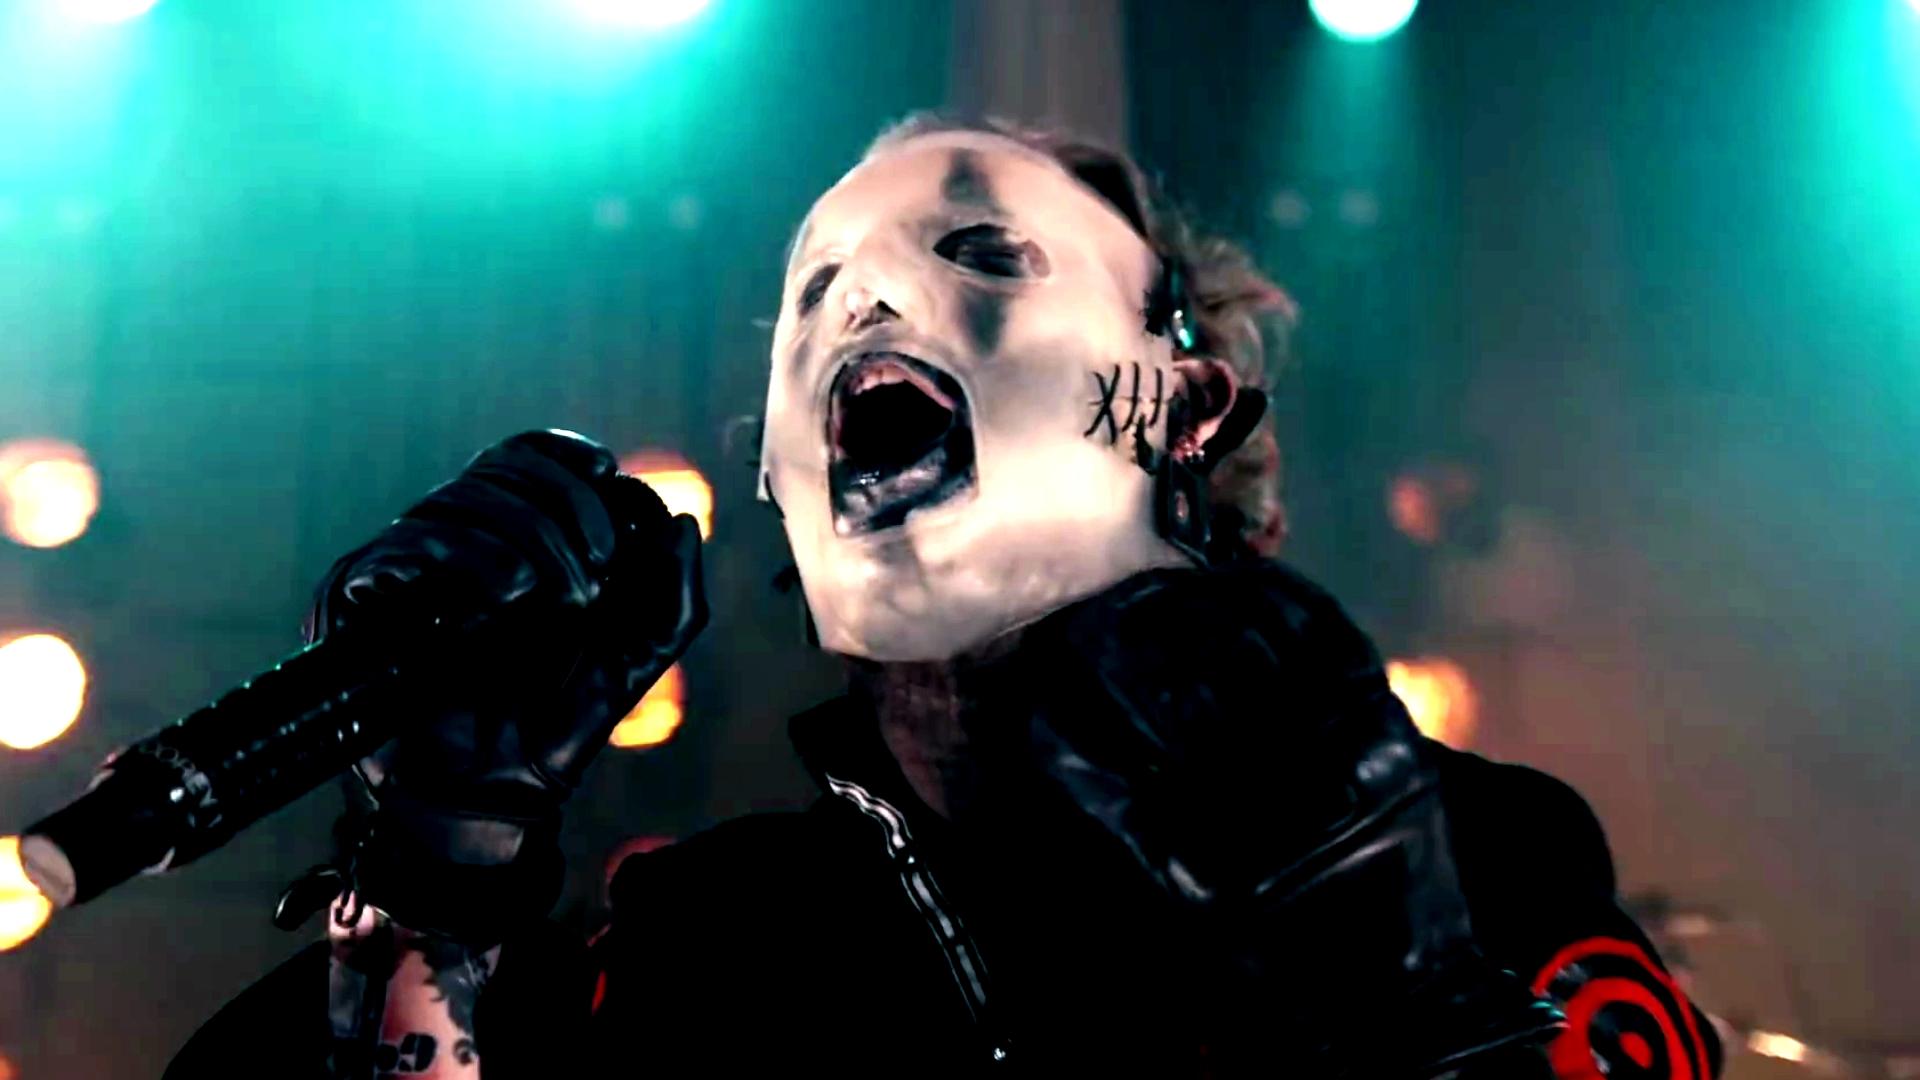 Slipknots Corey Taylor Says He Cut Himself During Iowa